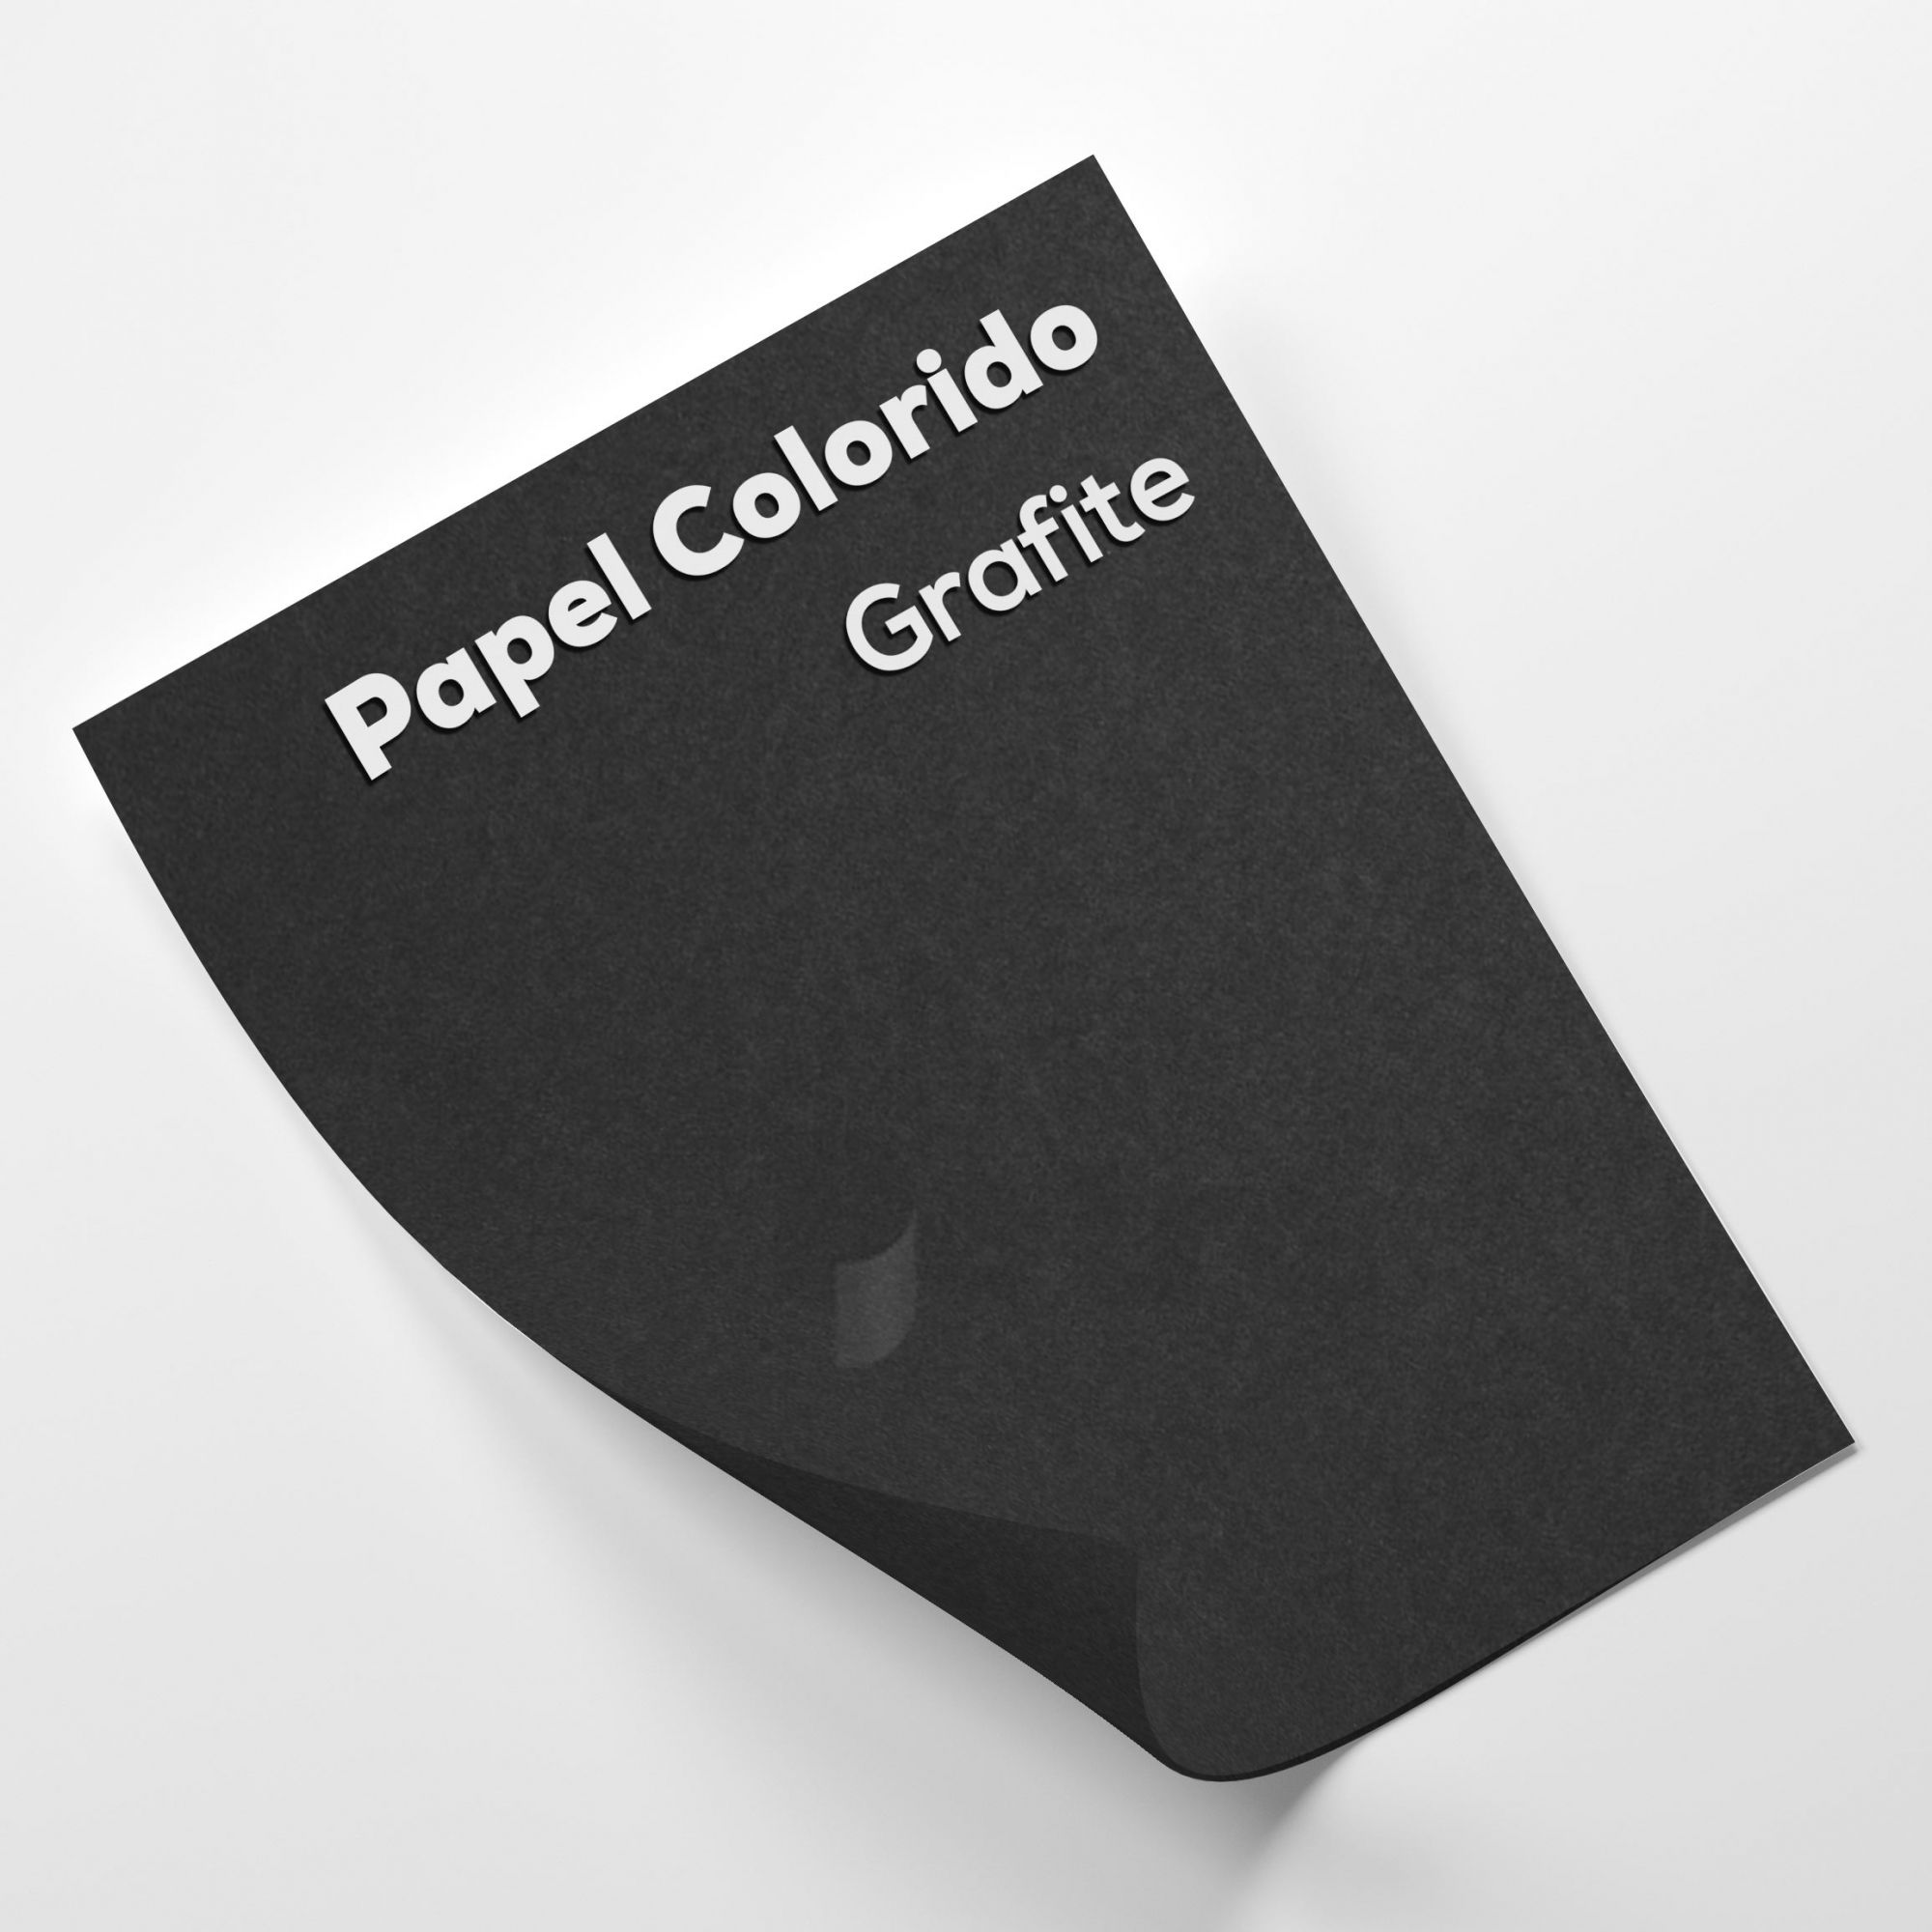 Papel Colorido Grafite - Cinza -  tam. A4 180g/m²